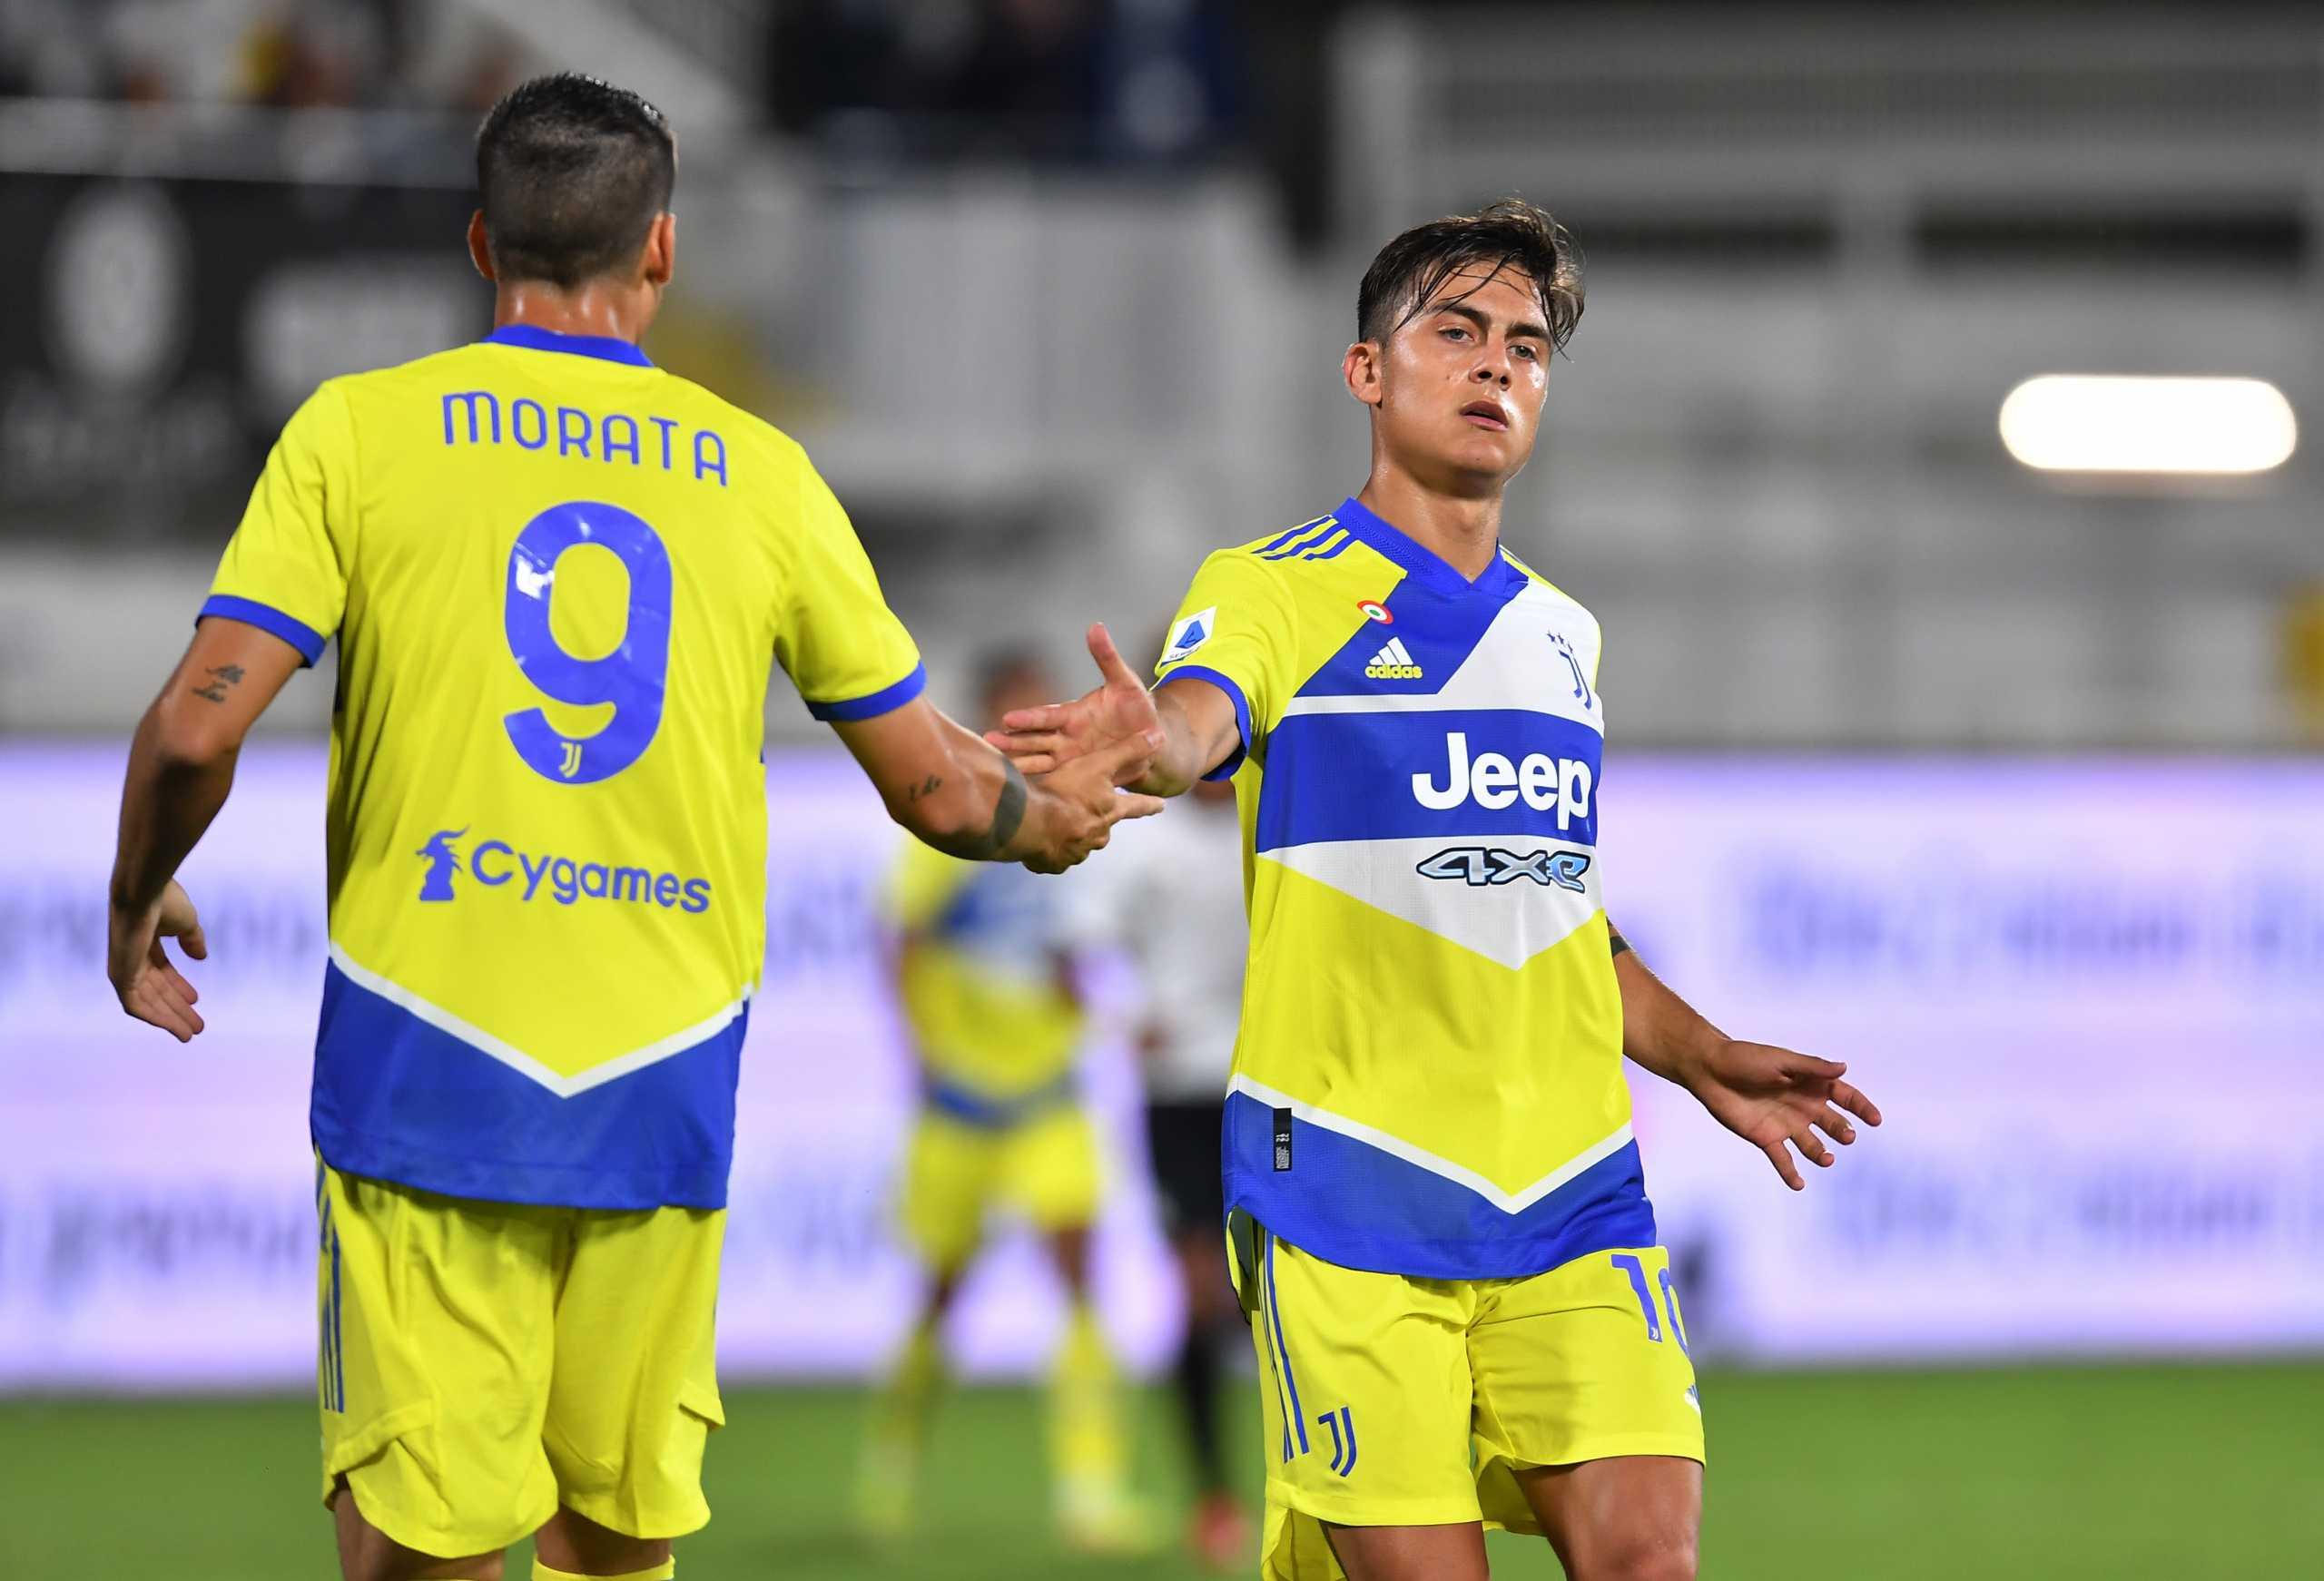 Champions League: Χωρίς Μοράτα και Ντιμπάλα η Γιουβέντους κόντρα στην Τσέλσι